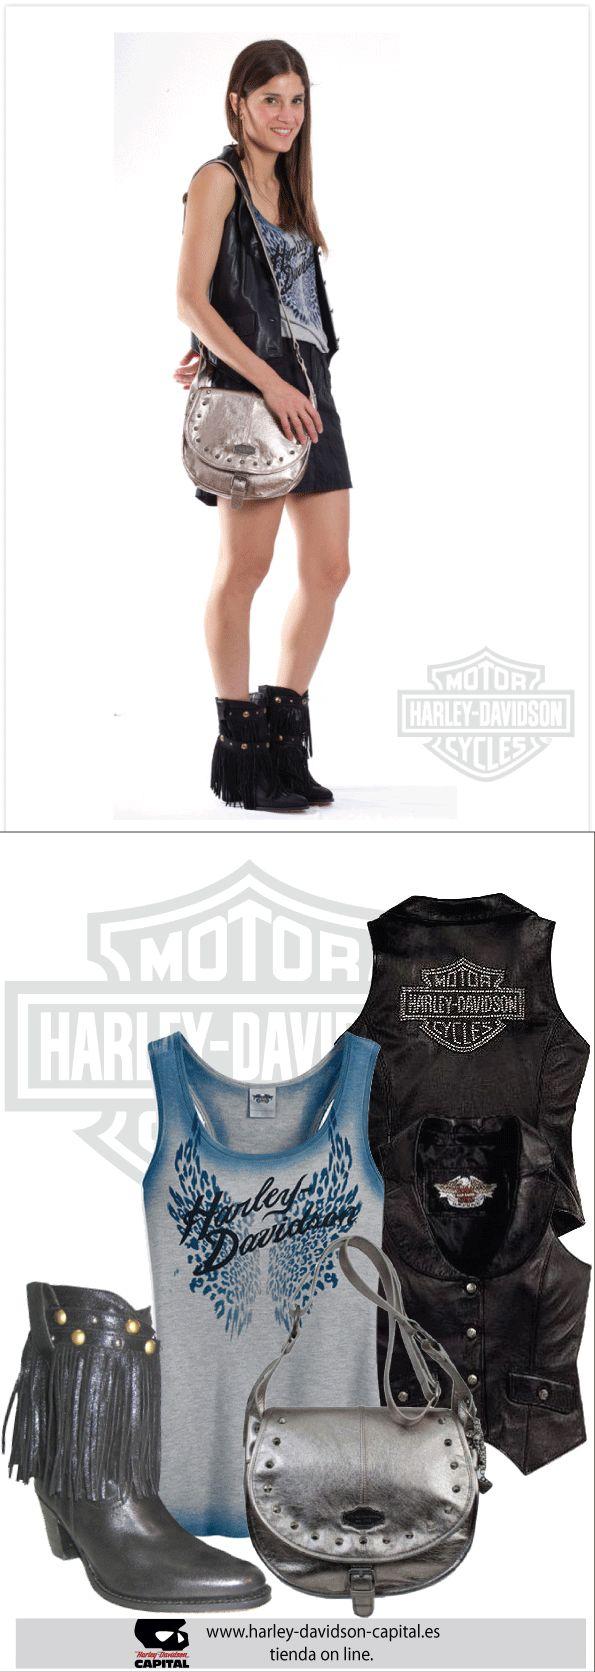 HARLEY-DAVIDSON STYLE | HARLEY-DAVIDSON OUTFIT | HARLEY-DAVIDSON LOOK |HARLEY-DAVIDSON FESTIVAL | camiseta harley-davidson, chaleco harley-davidsonn, bolso harley-davidson,| BOTAS SENDRA